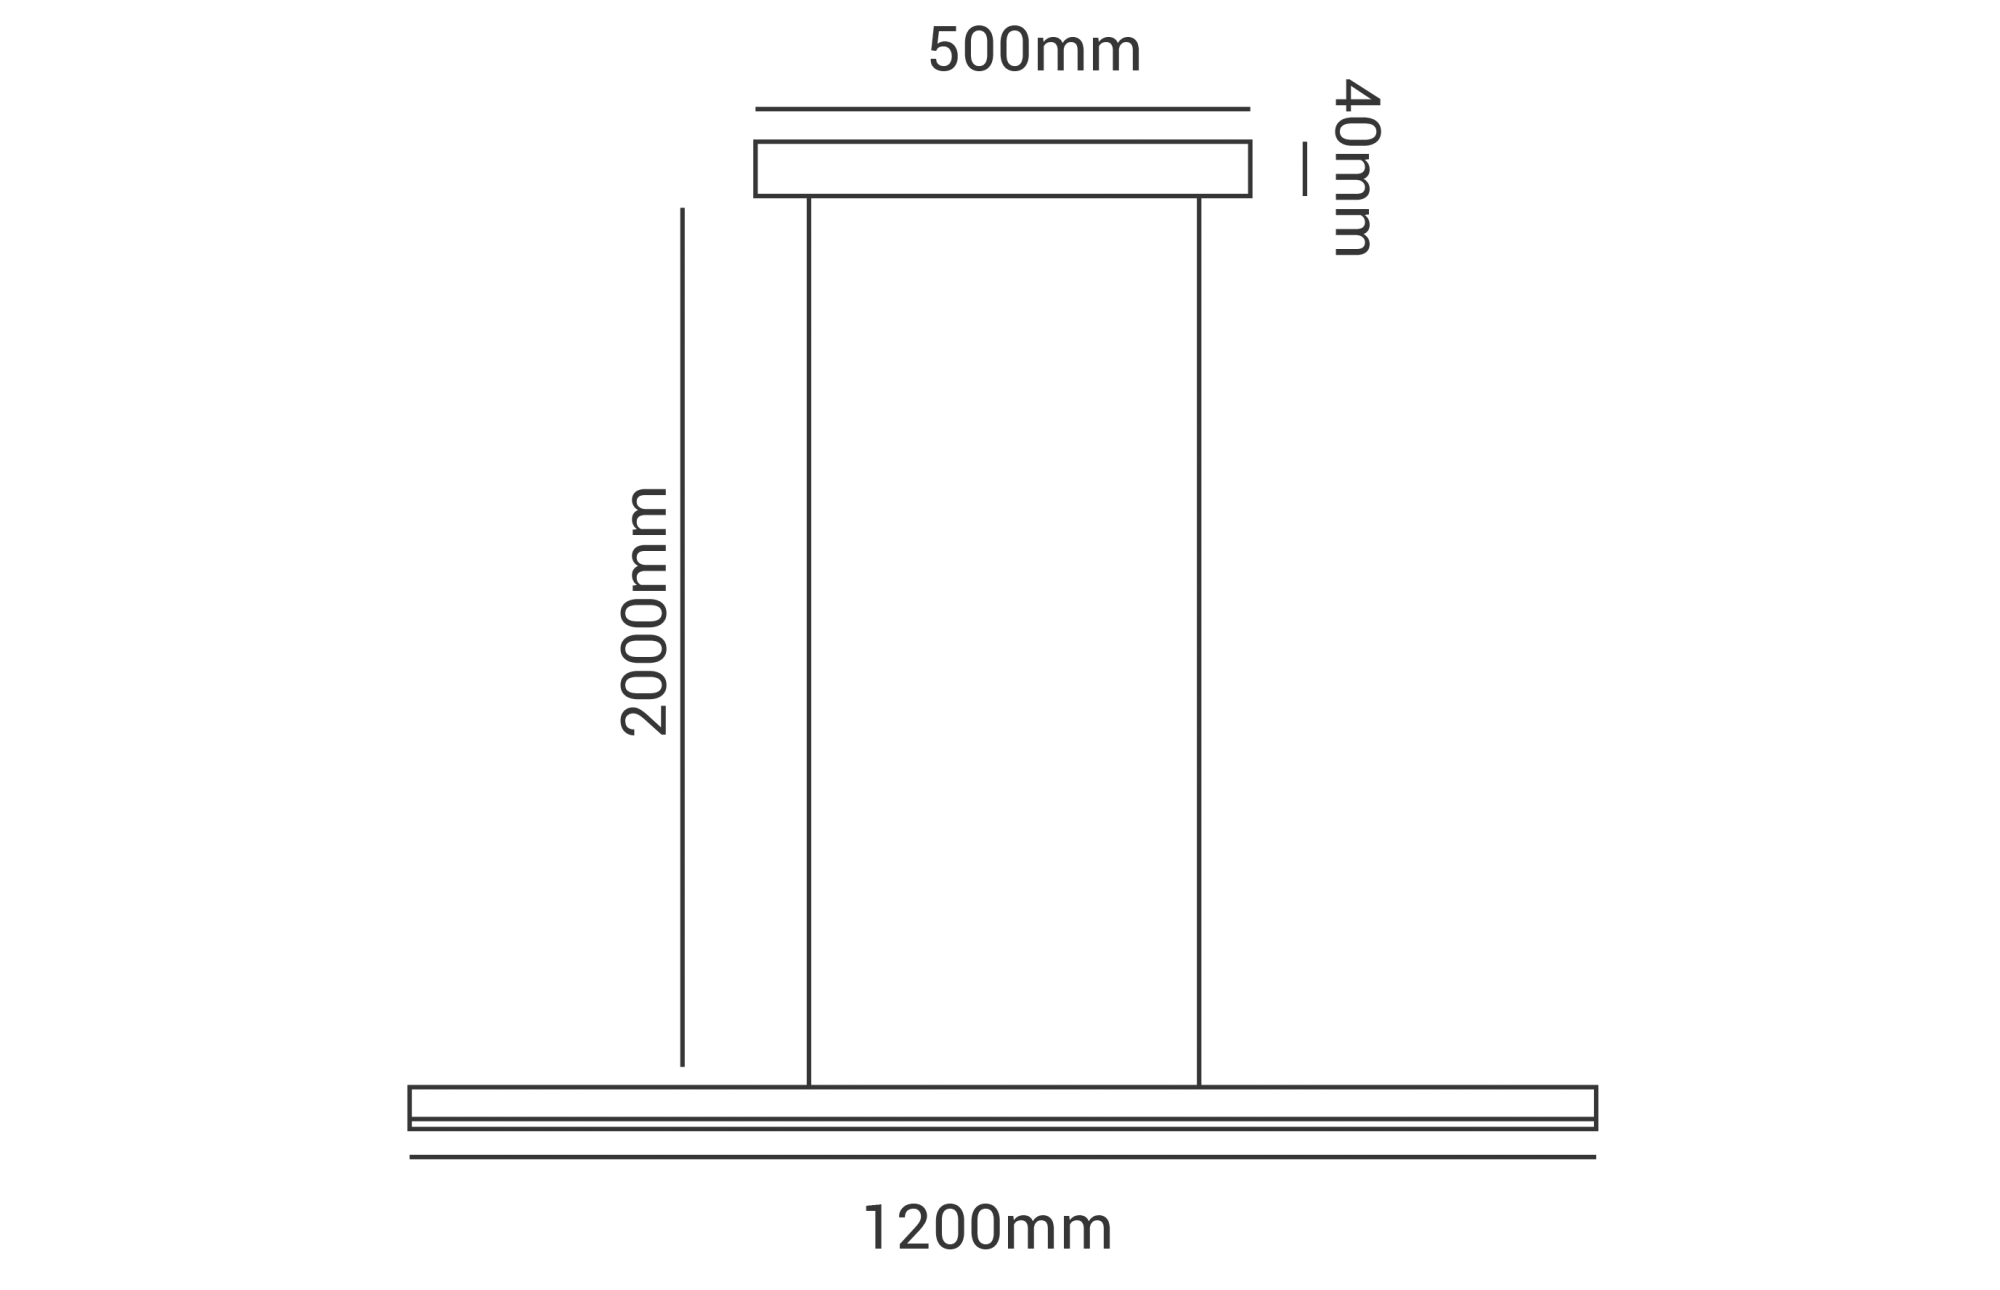 Pendente LED Opus DN35826 Zion 41W 4000K IP20 Bivolt Ø1200x500x2000mm Branco